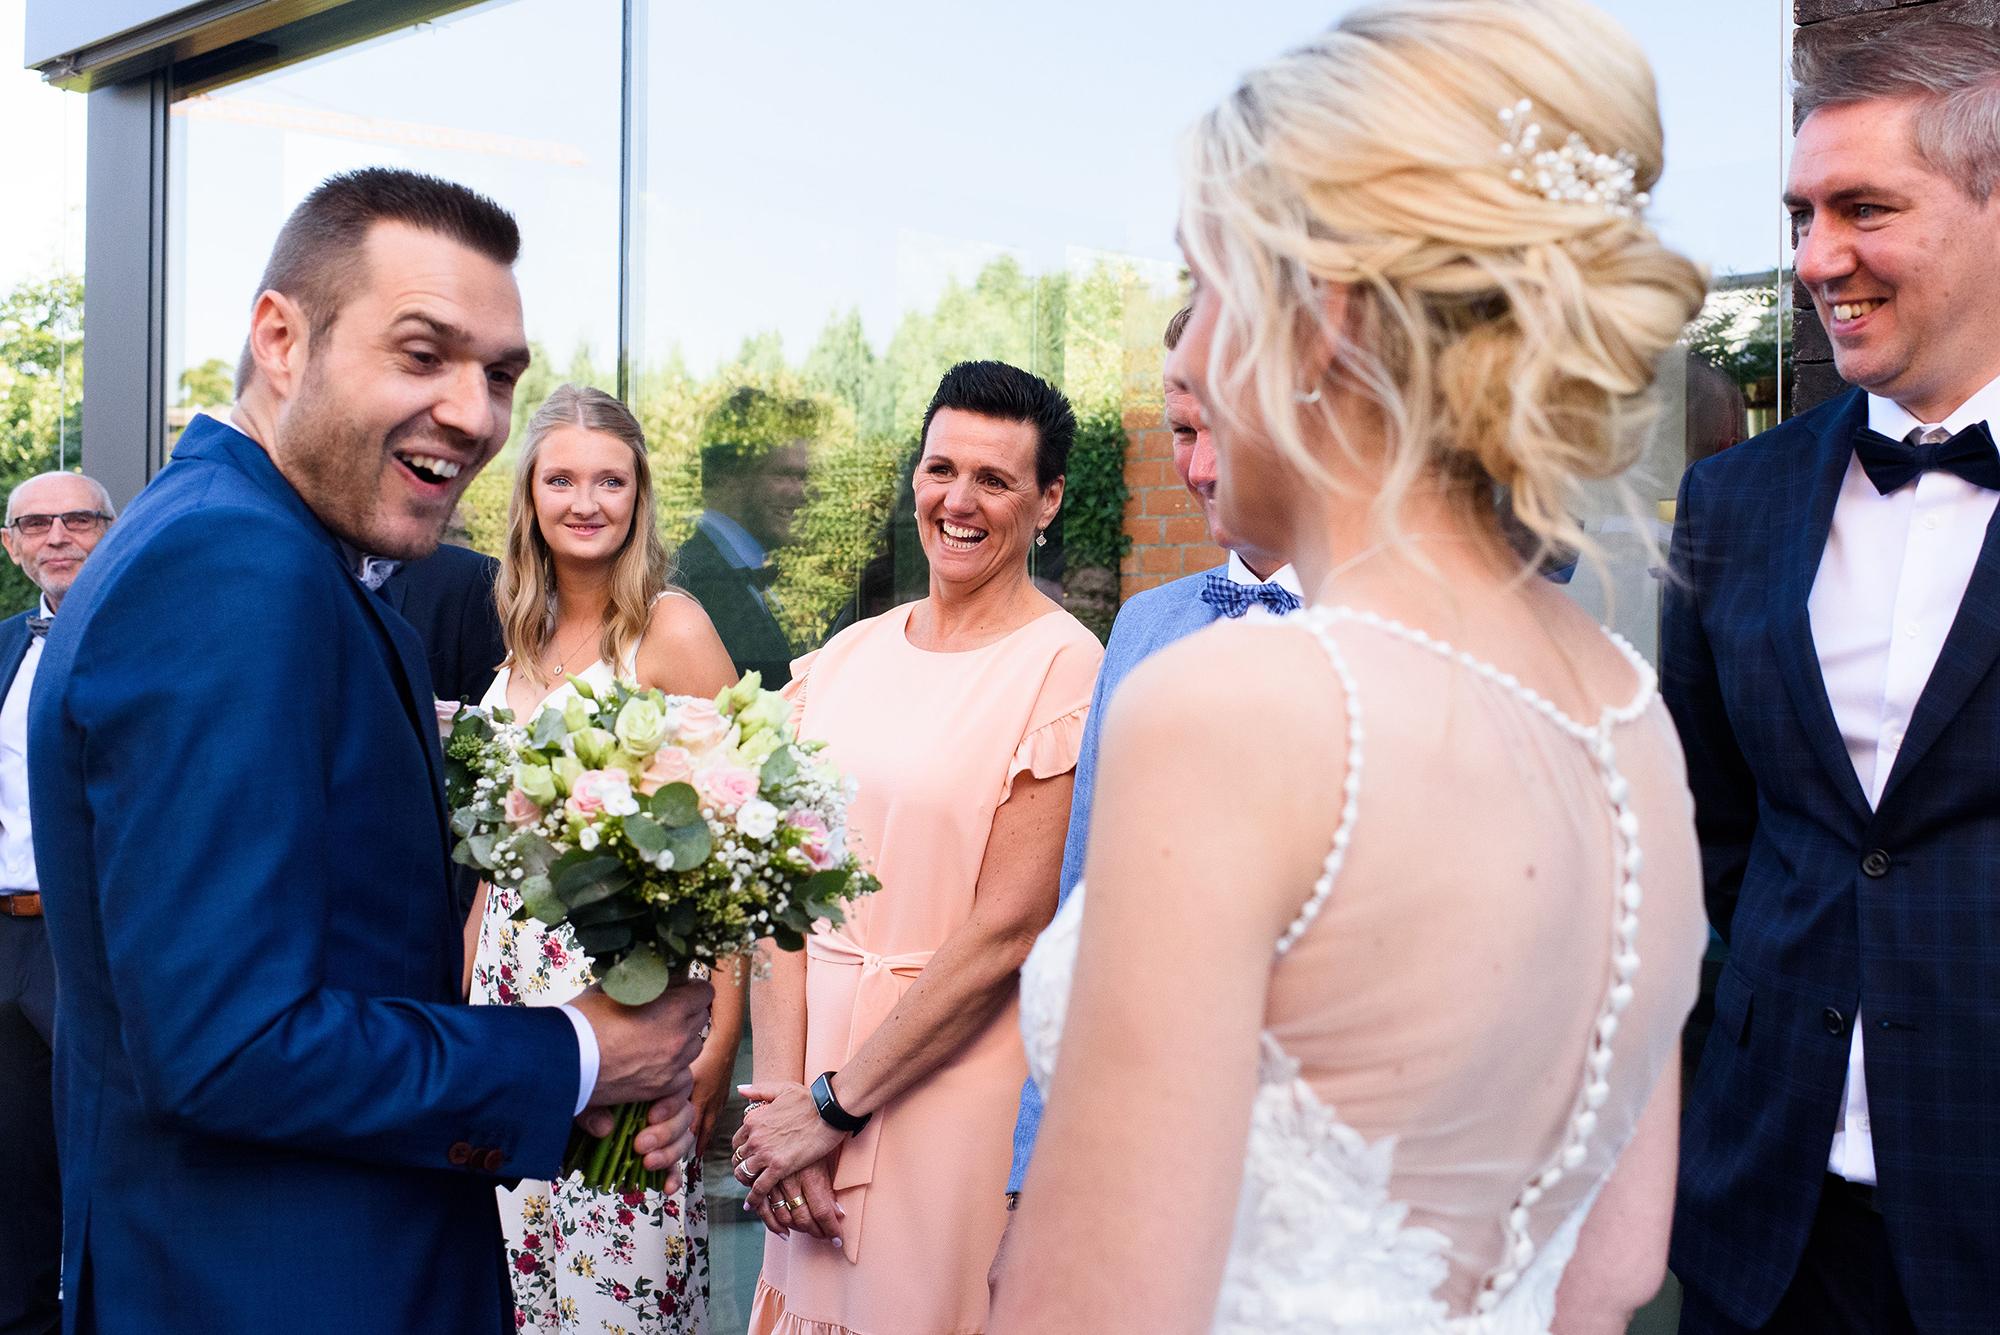 Fiere bruidegom